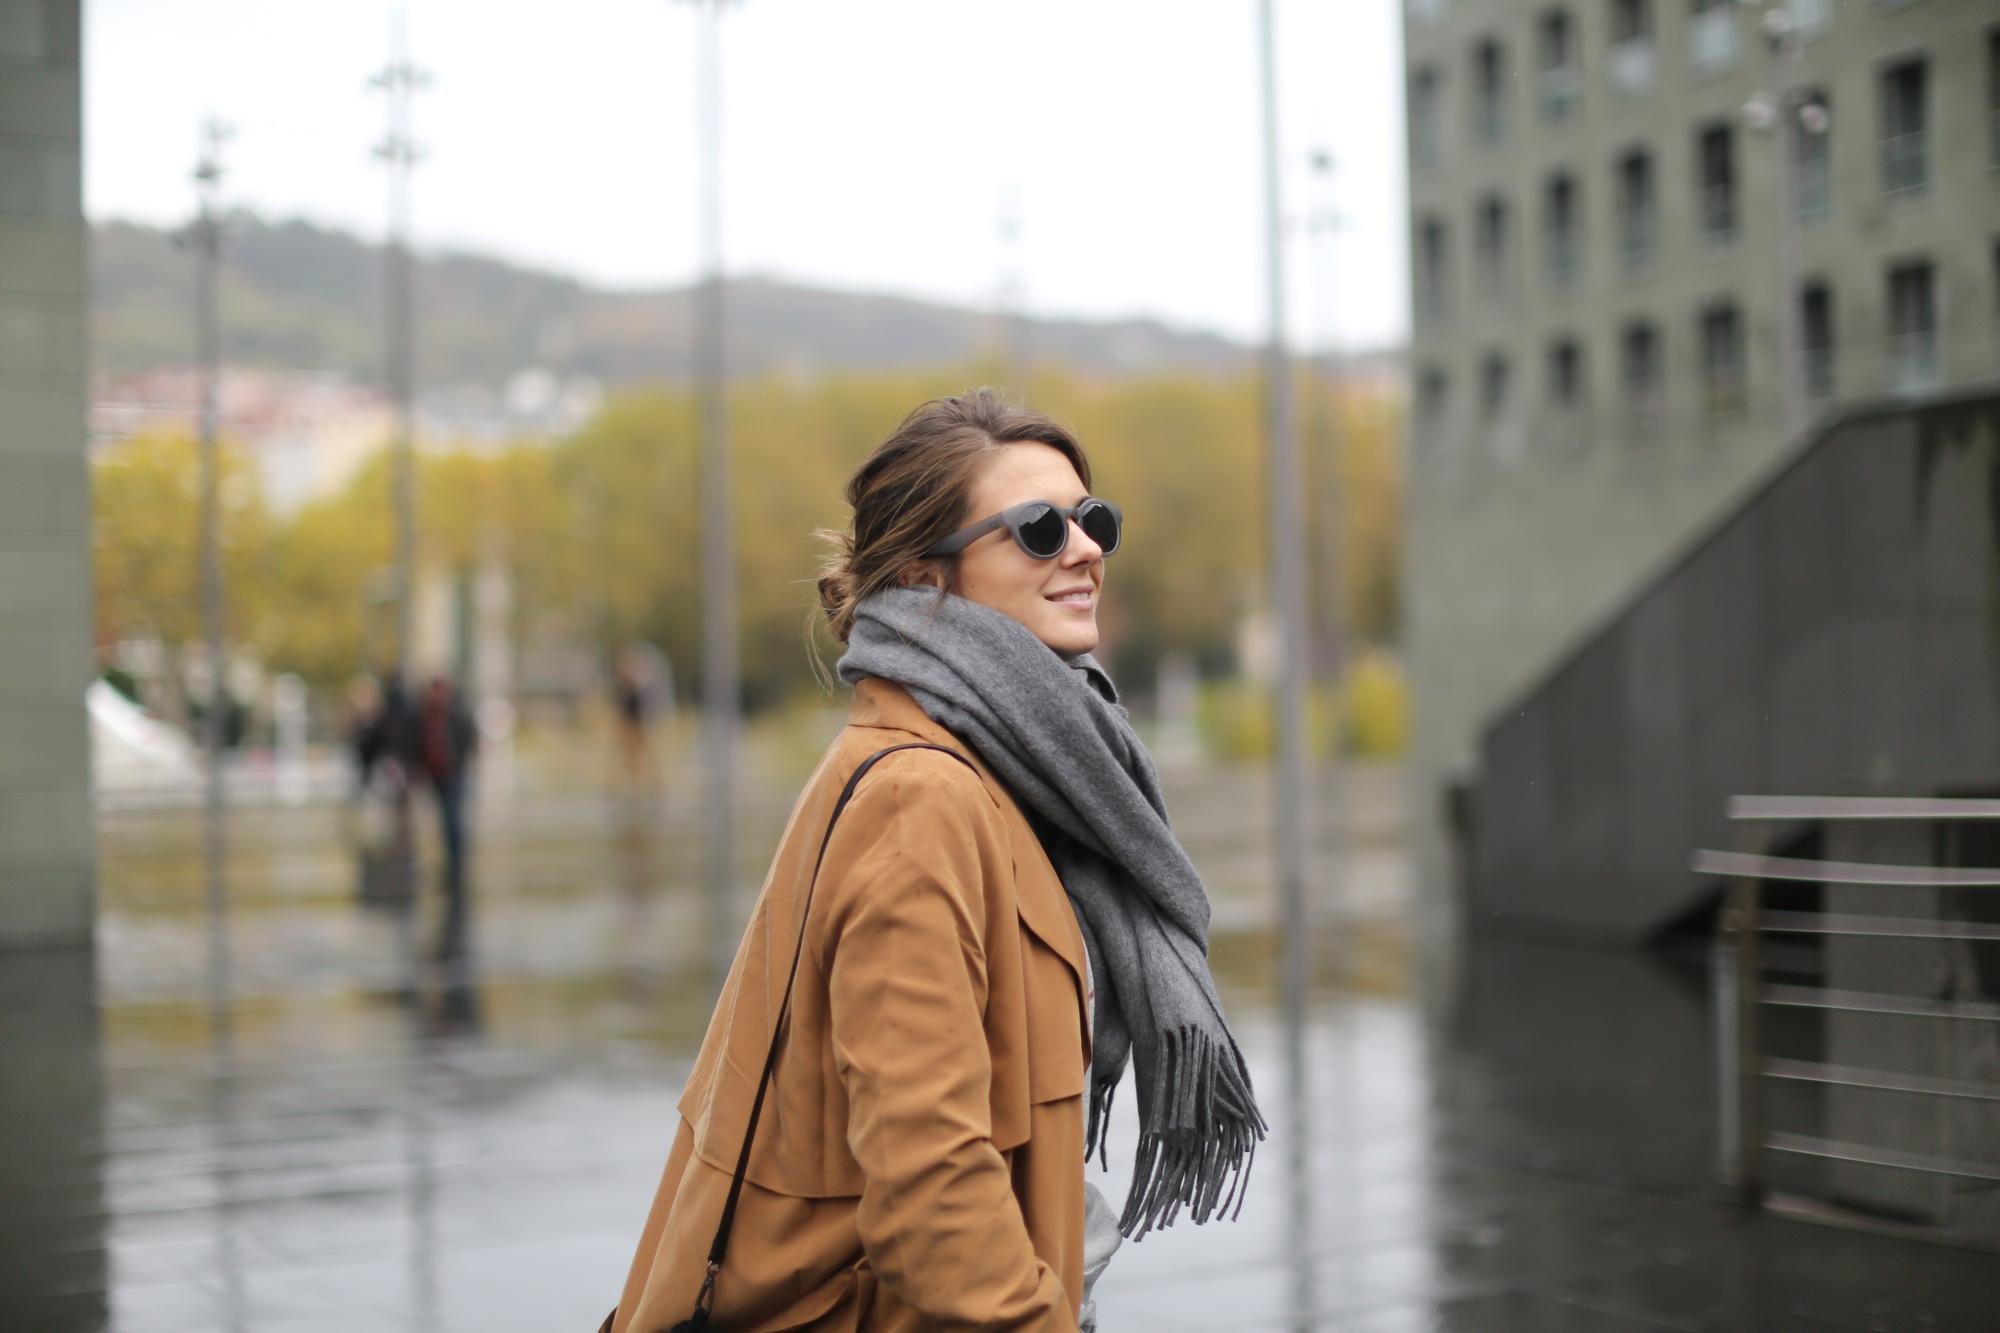 Clochet-streetstyle-isabel-marant-etoile-revolution-sweatshirt-adidas-stan-smith-monki-trench-coat-6